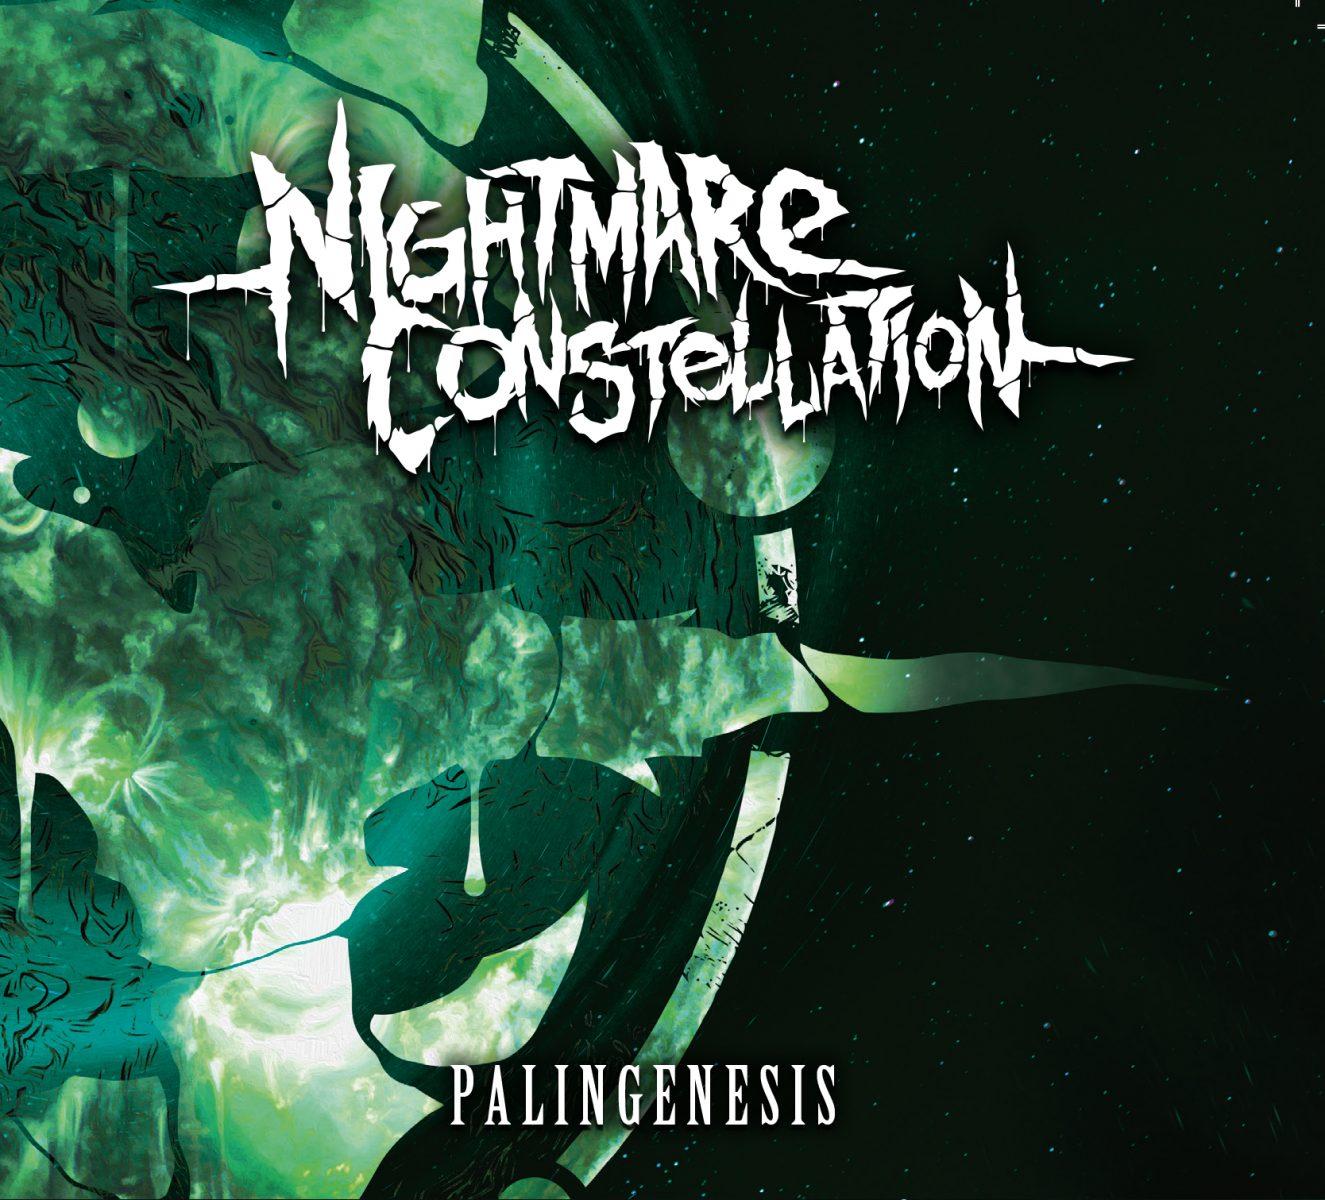 nightmare-constellation-palingenesis-keine-kompromisse-album-review